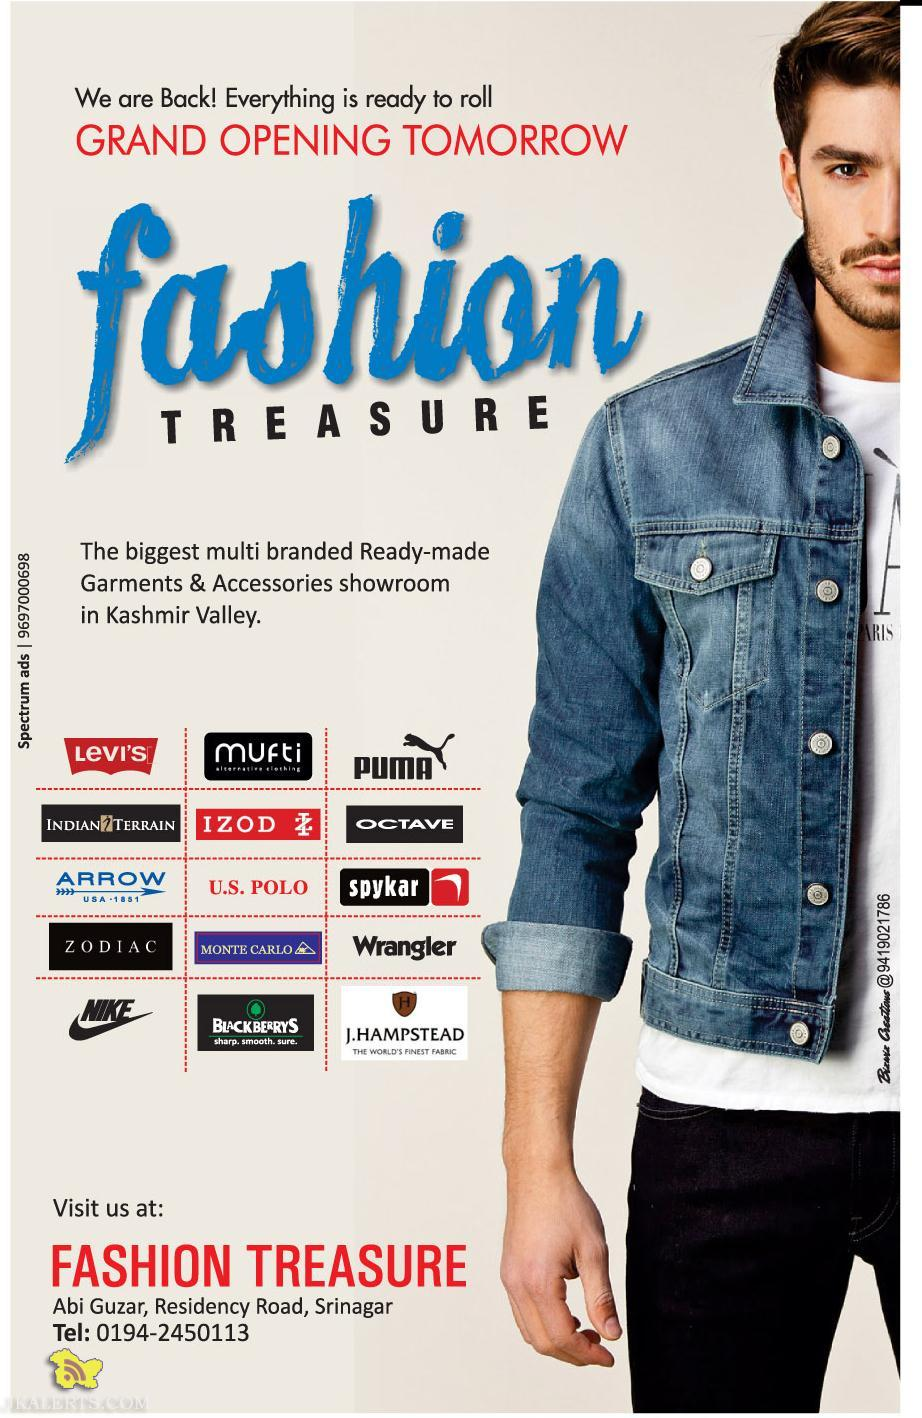 Fashion treasure opening in Residency road Srinagar